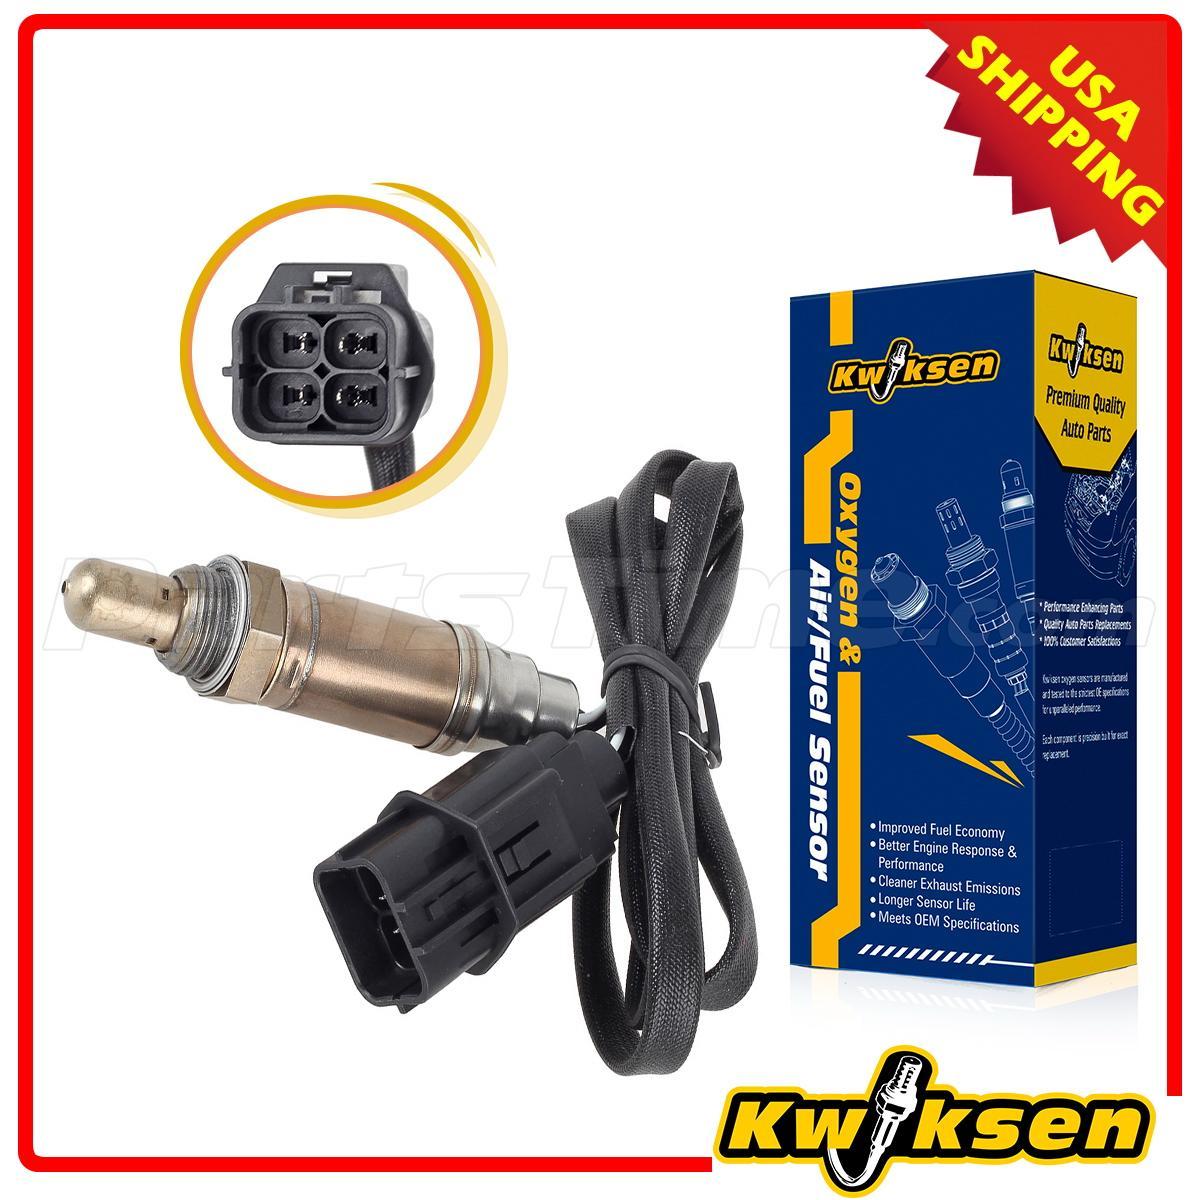 2001 Nissan Sentra O2 Sensor - Image Is Loading X Oxygen O Bank For - 2001 Nissan Sentra O2 Sensor